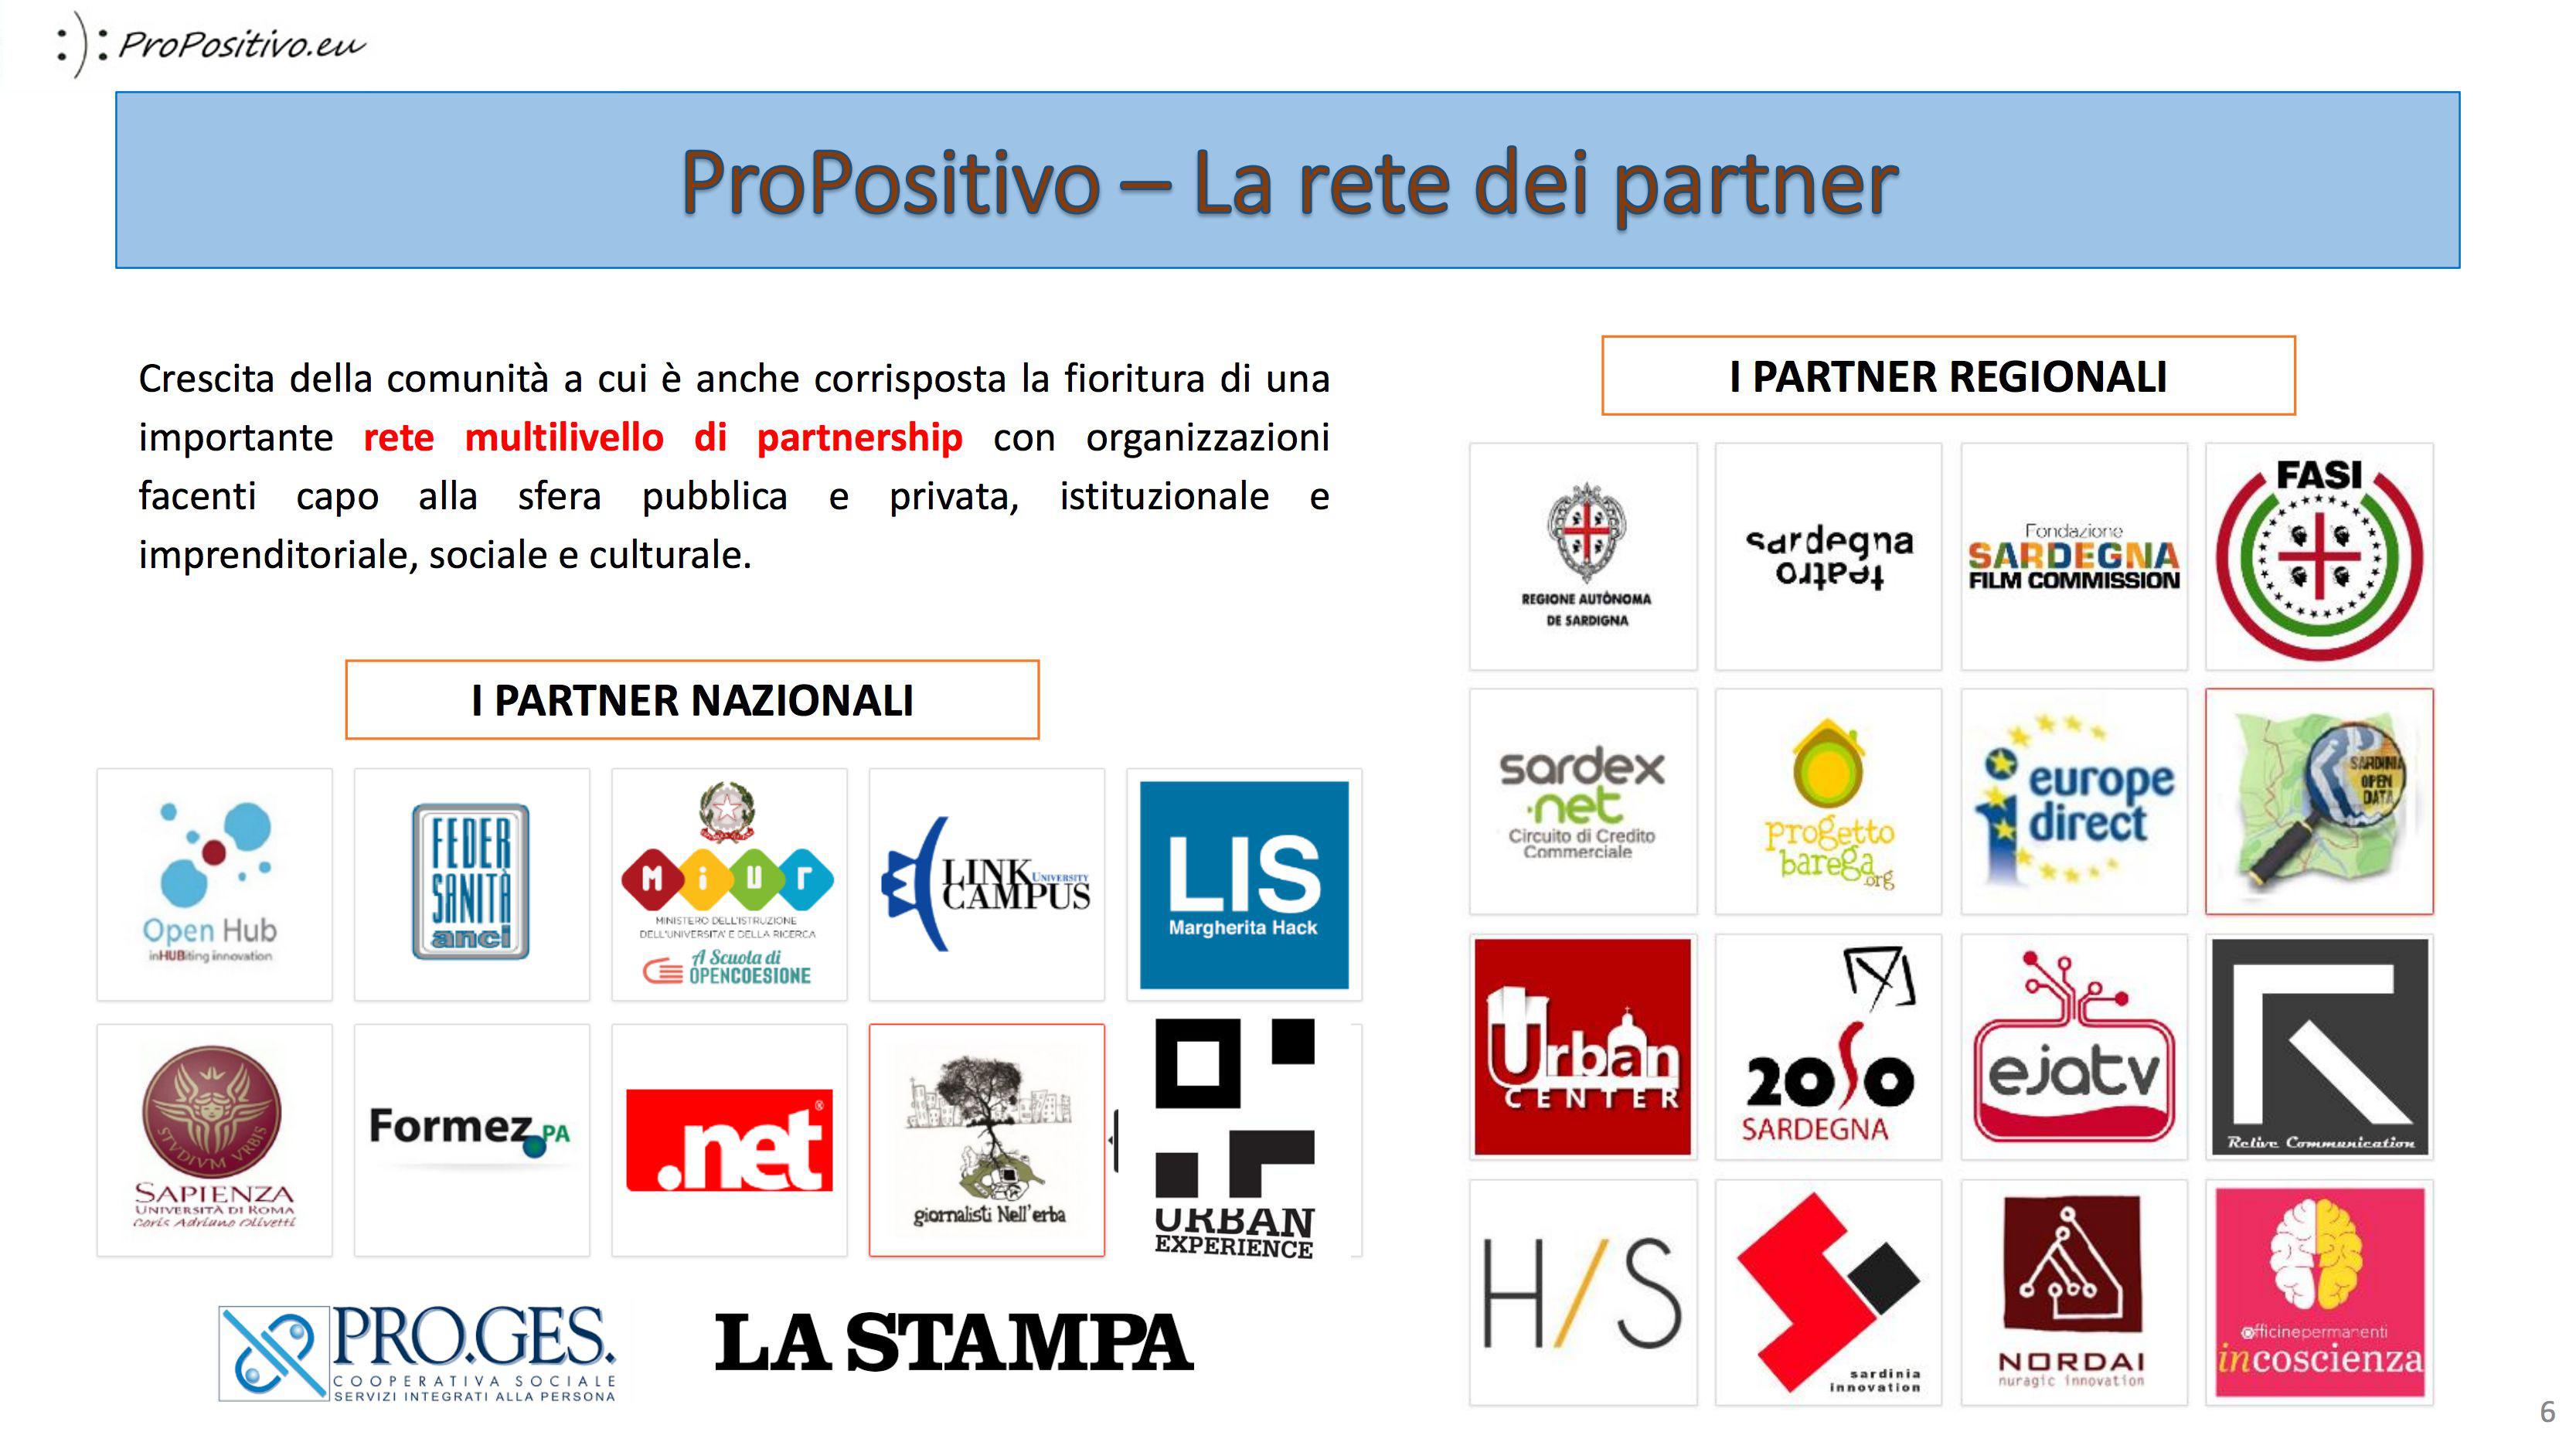 ProPositivo-Master-Plan-2017_6-1